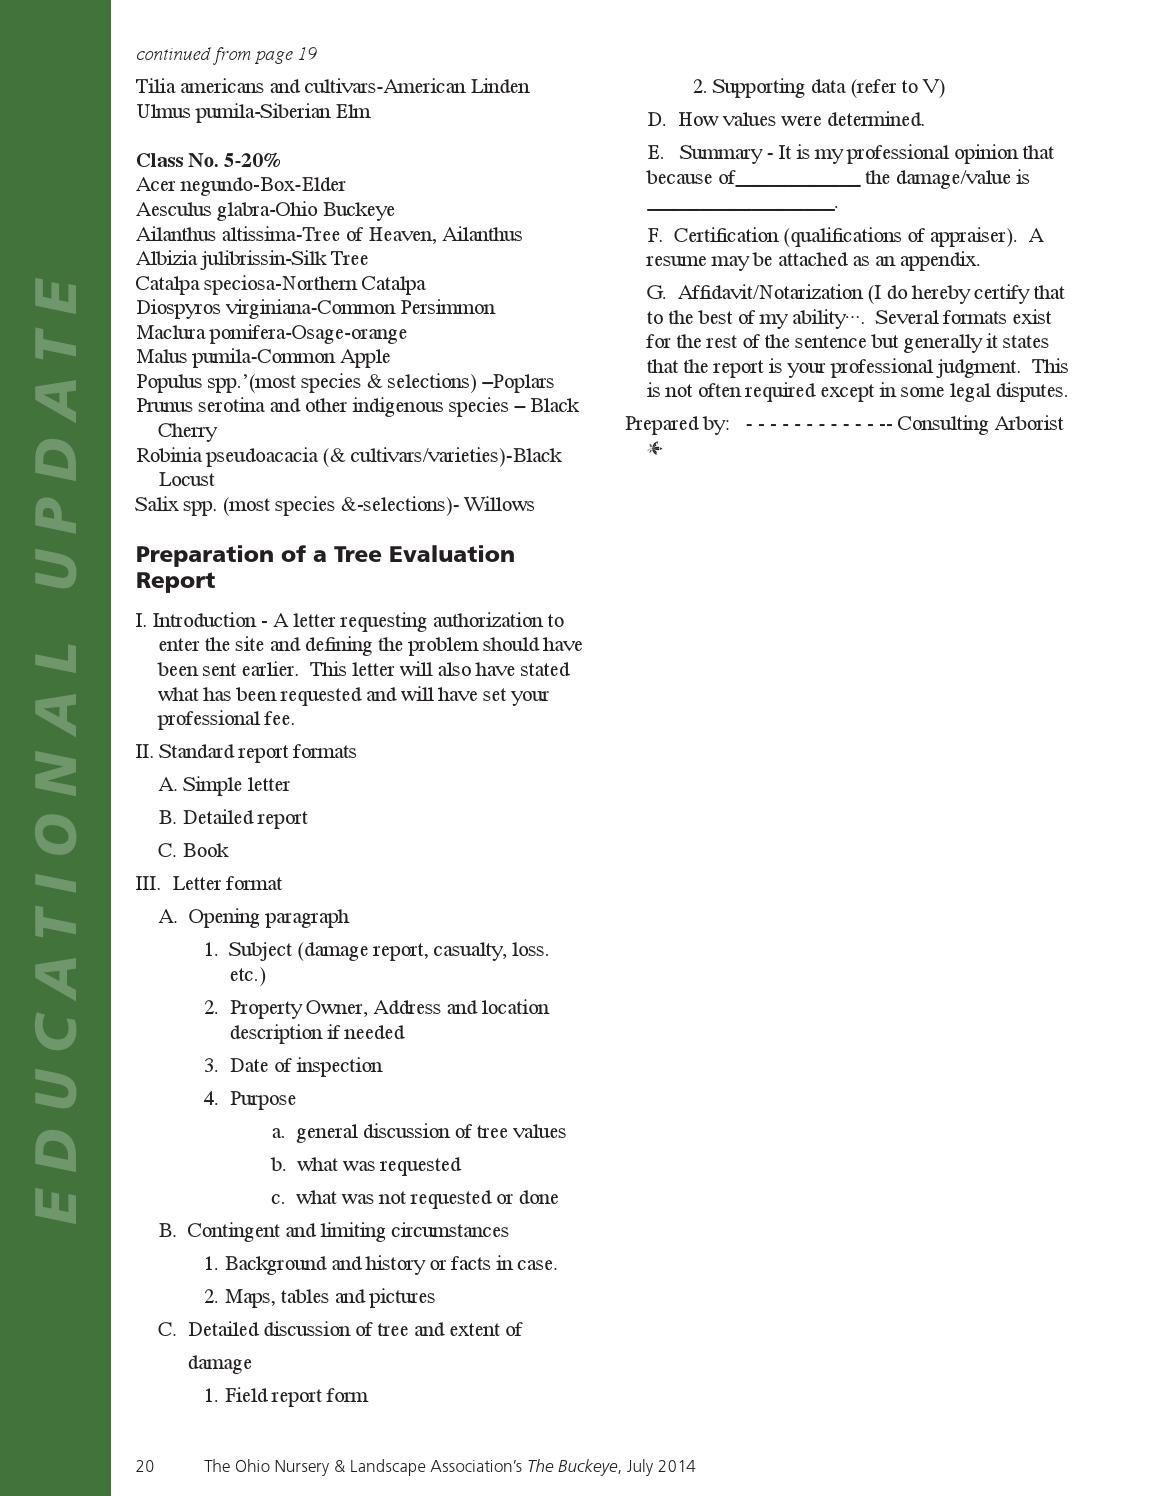 The Buckeye, July 2014 Volume 25, Issue 6 by ONLA - issuu